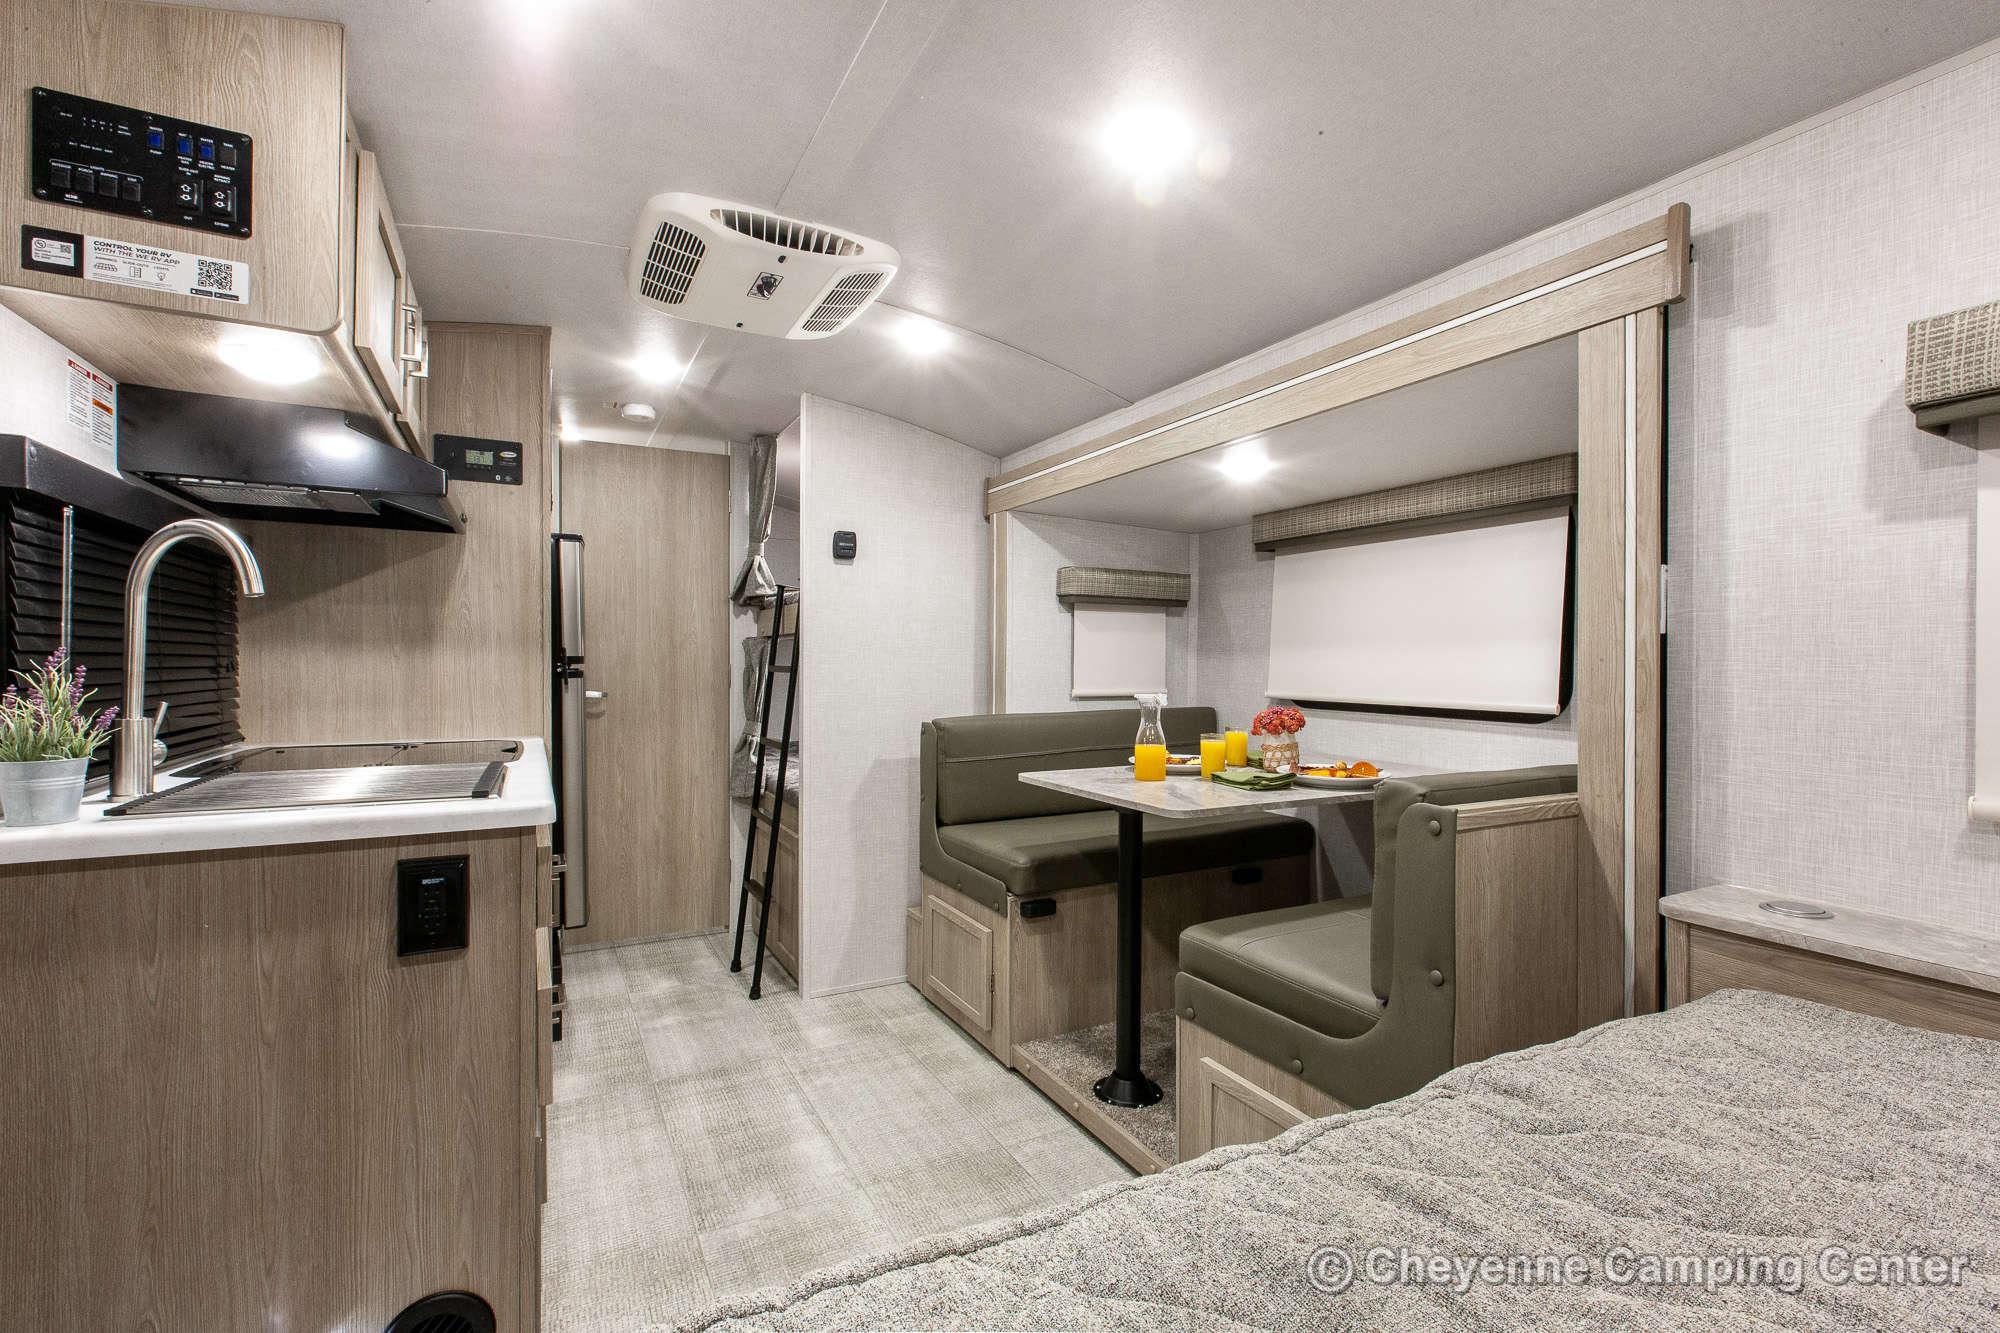 2022 Forest River Flagstaff E-Pro E20BHS Bunkhouse Travel Trailer Interior Image